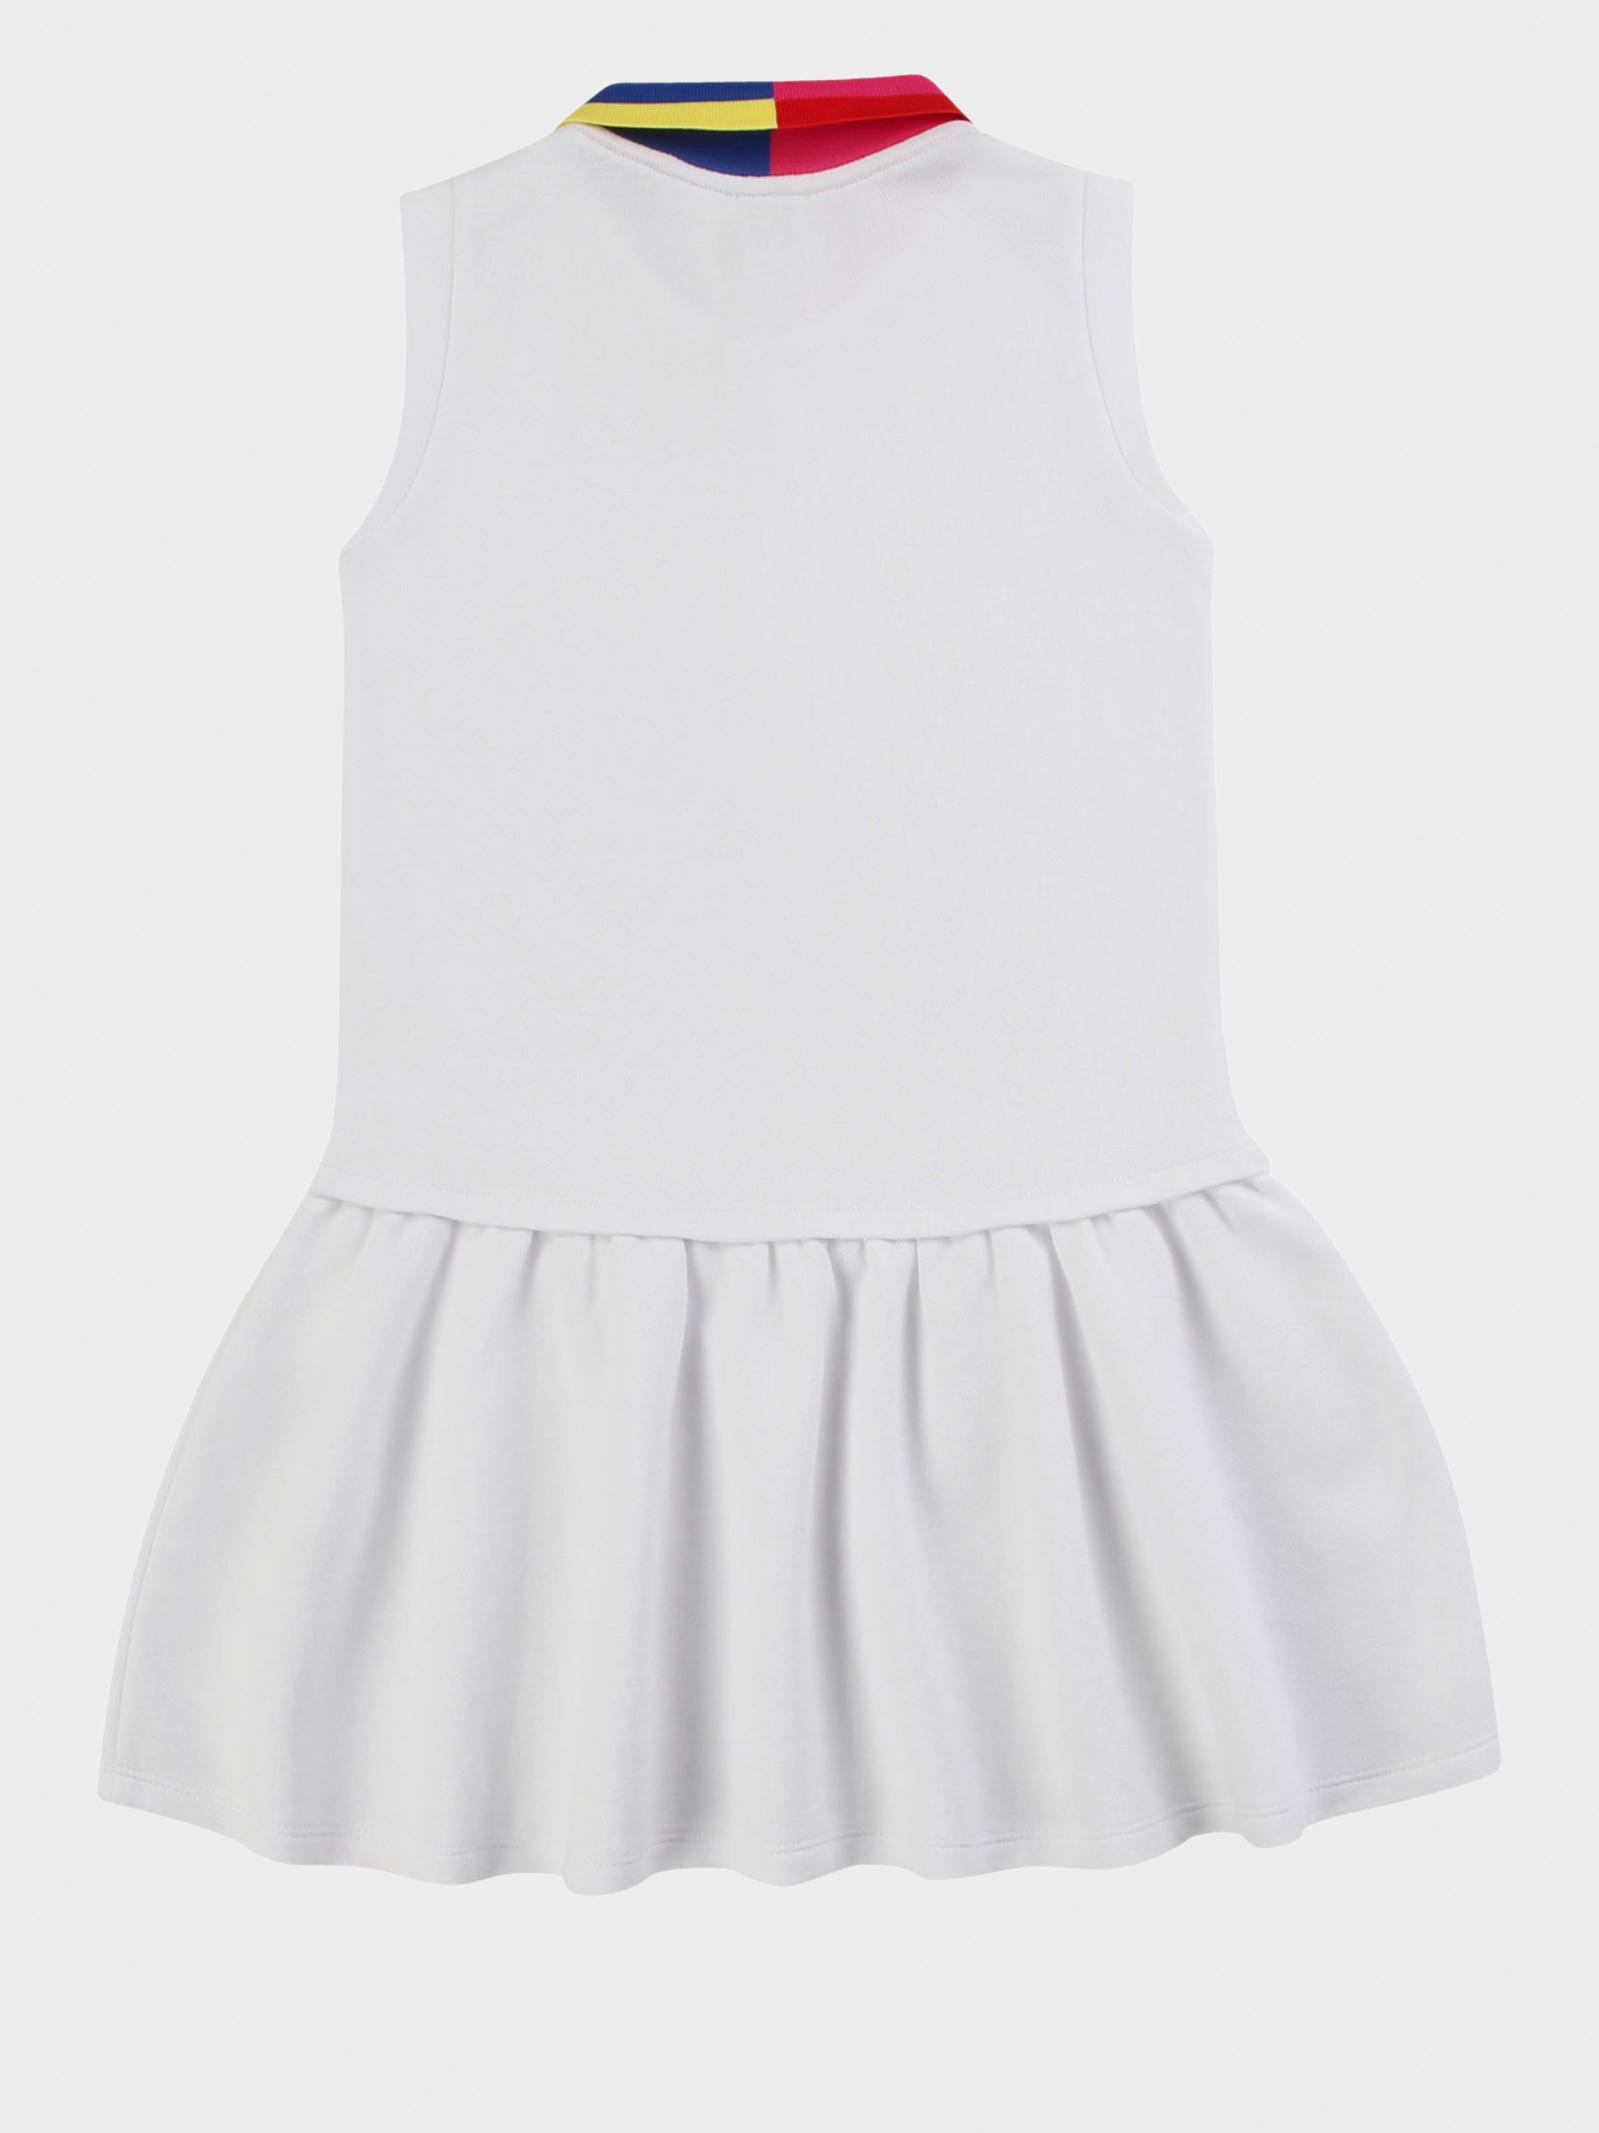 Платье детские KARL LAGERFELD модель HR239 отзывы, 2017